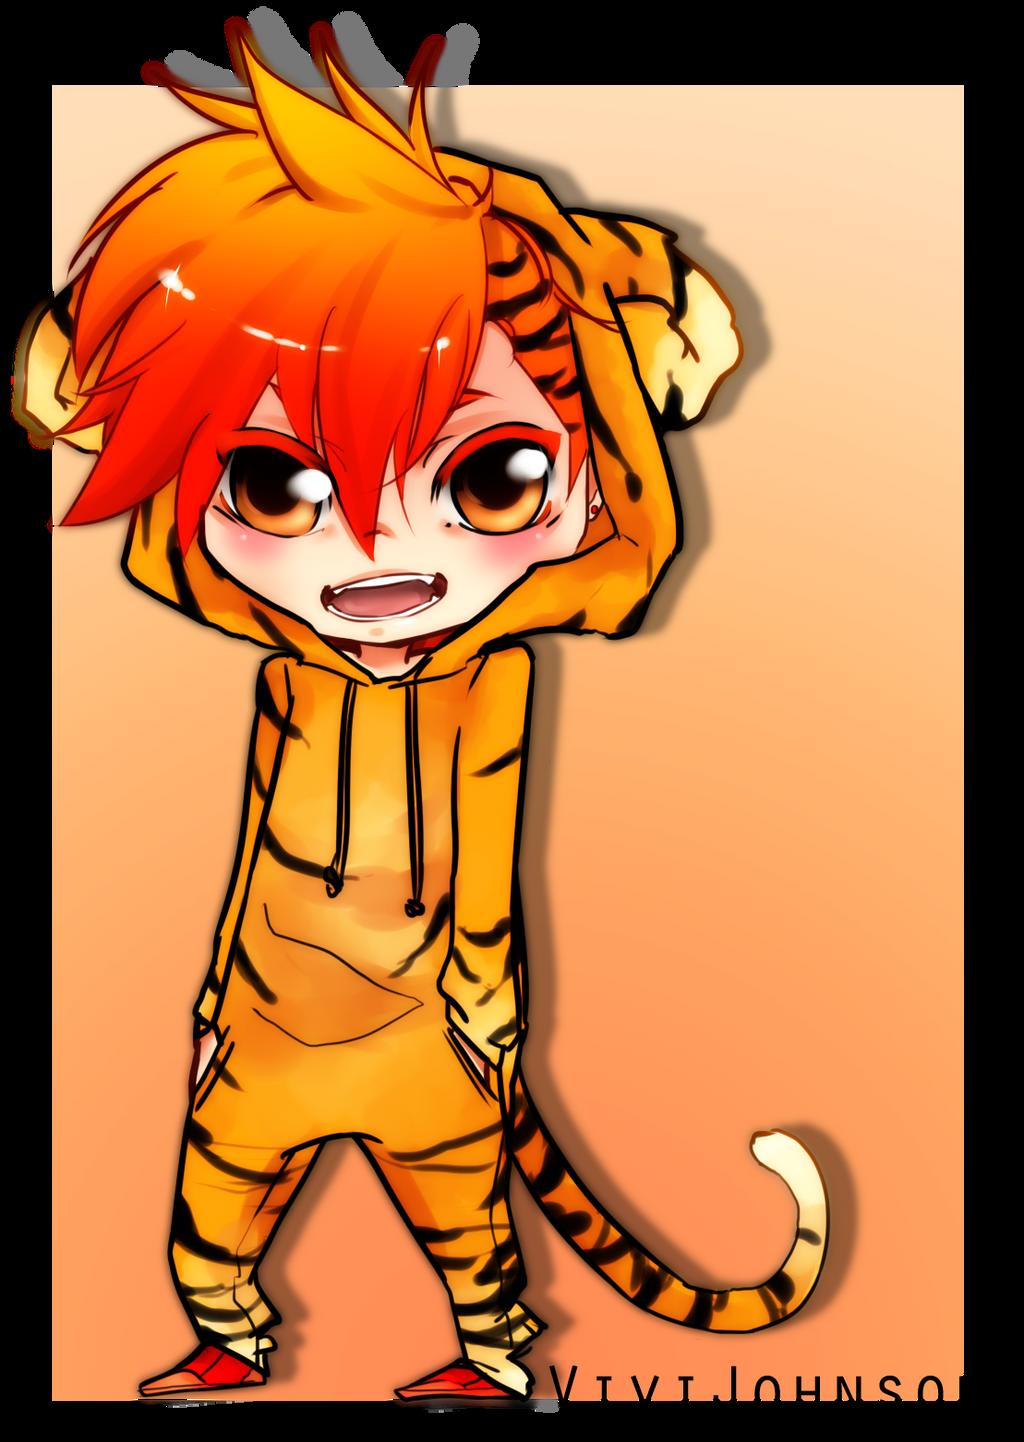 Cute Chibi Tiger Chibi Tiger by Vijohnsyu